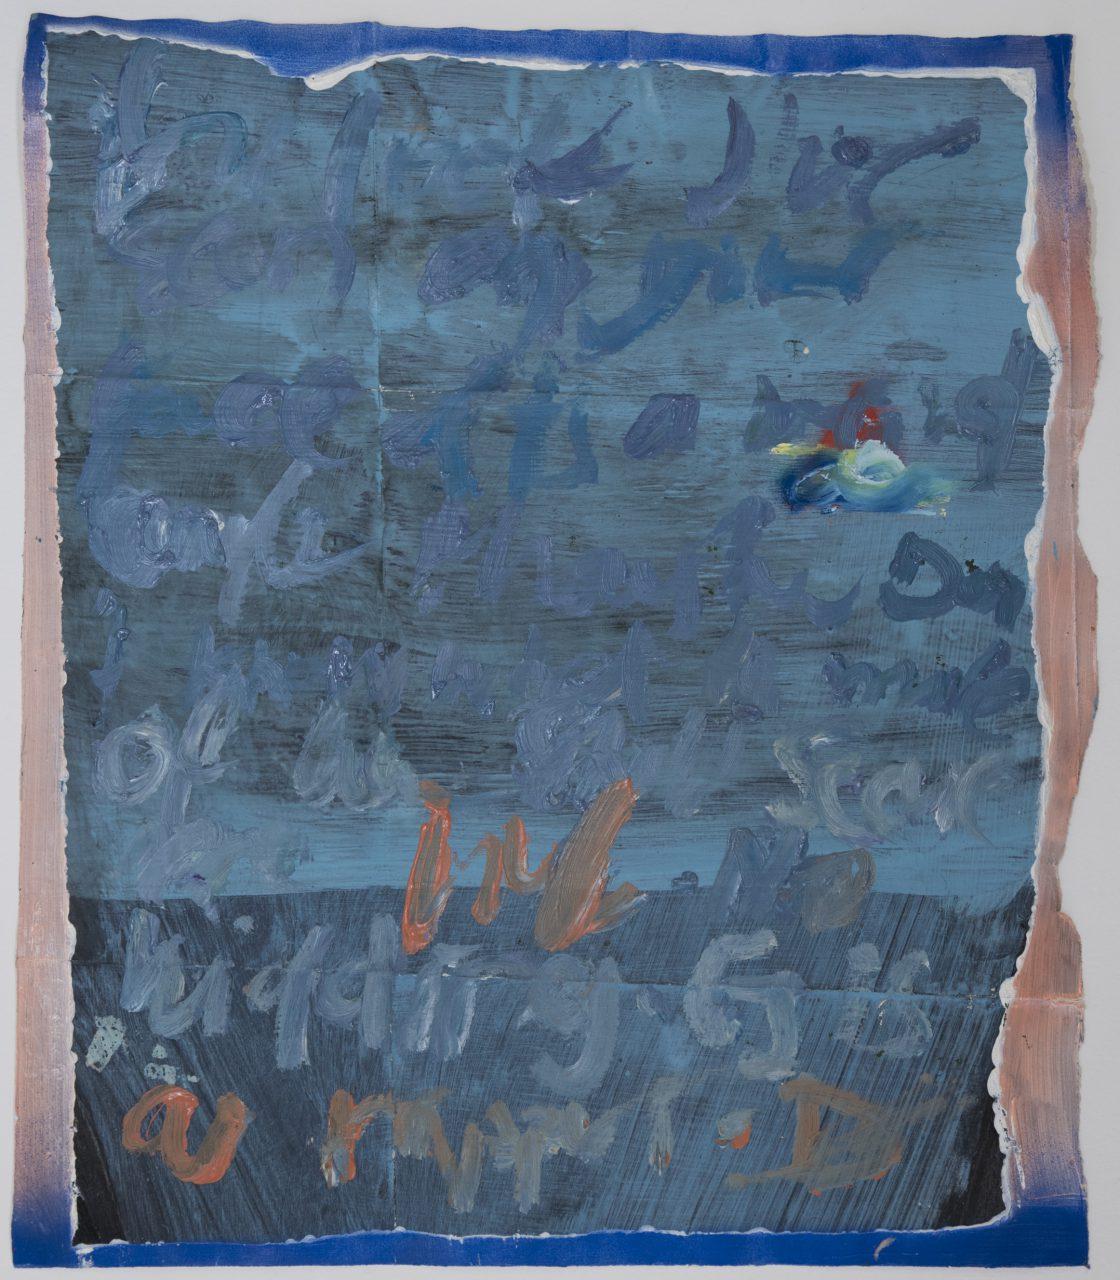 Text JG, 2017, oil on paper, 36 x 30 cm